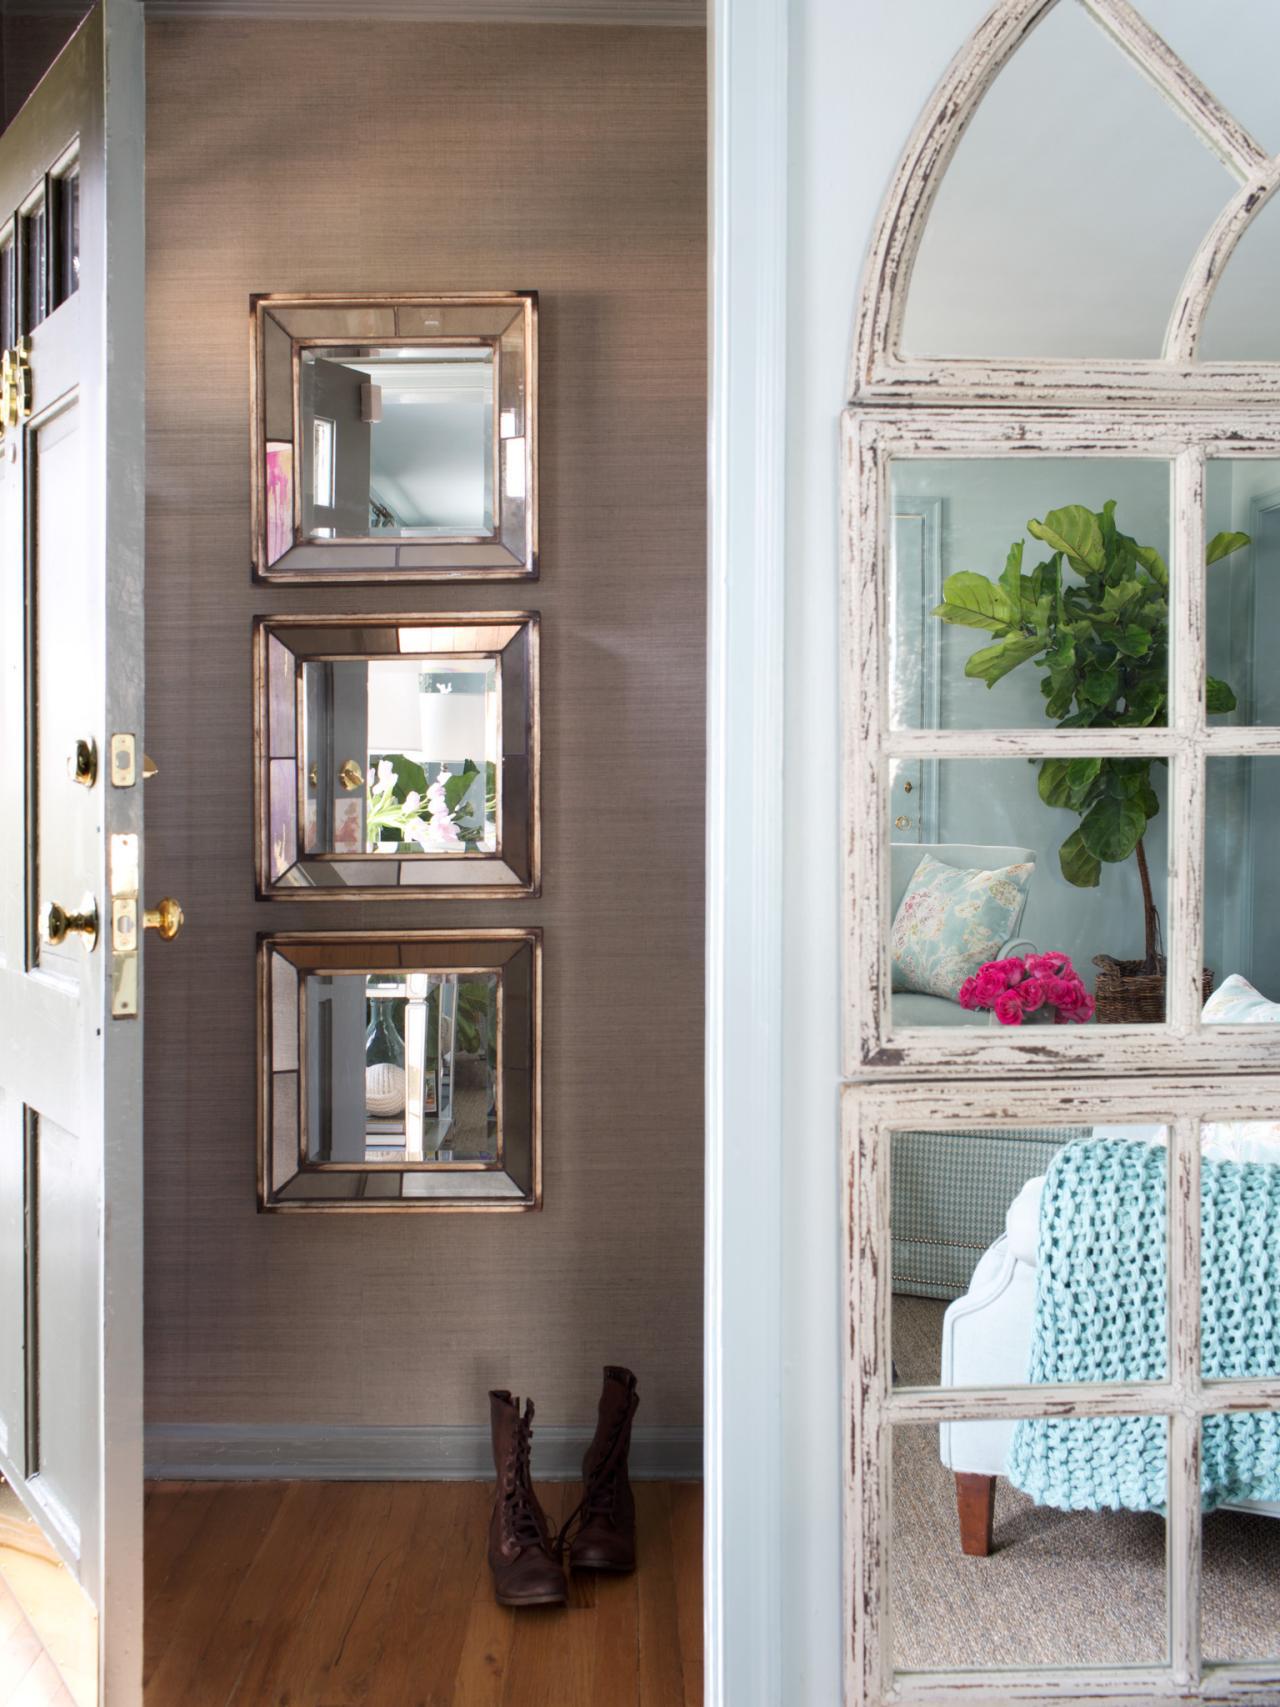 bpf_spring-house_interior_small-living-room-ideas_reflection_v-jpg-rend-hgtvcom-1280-1707